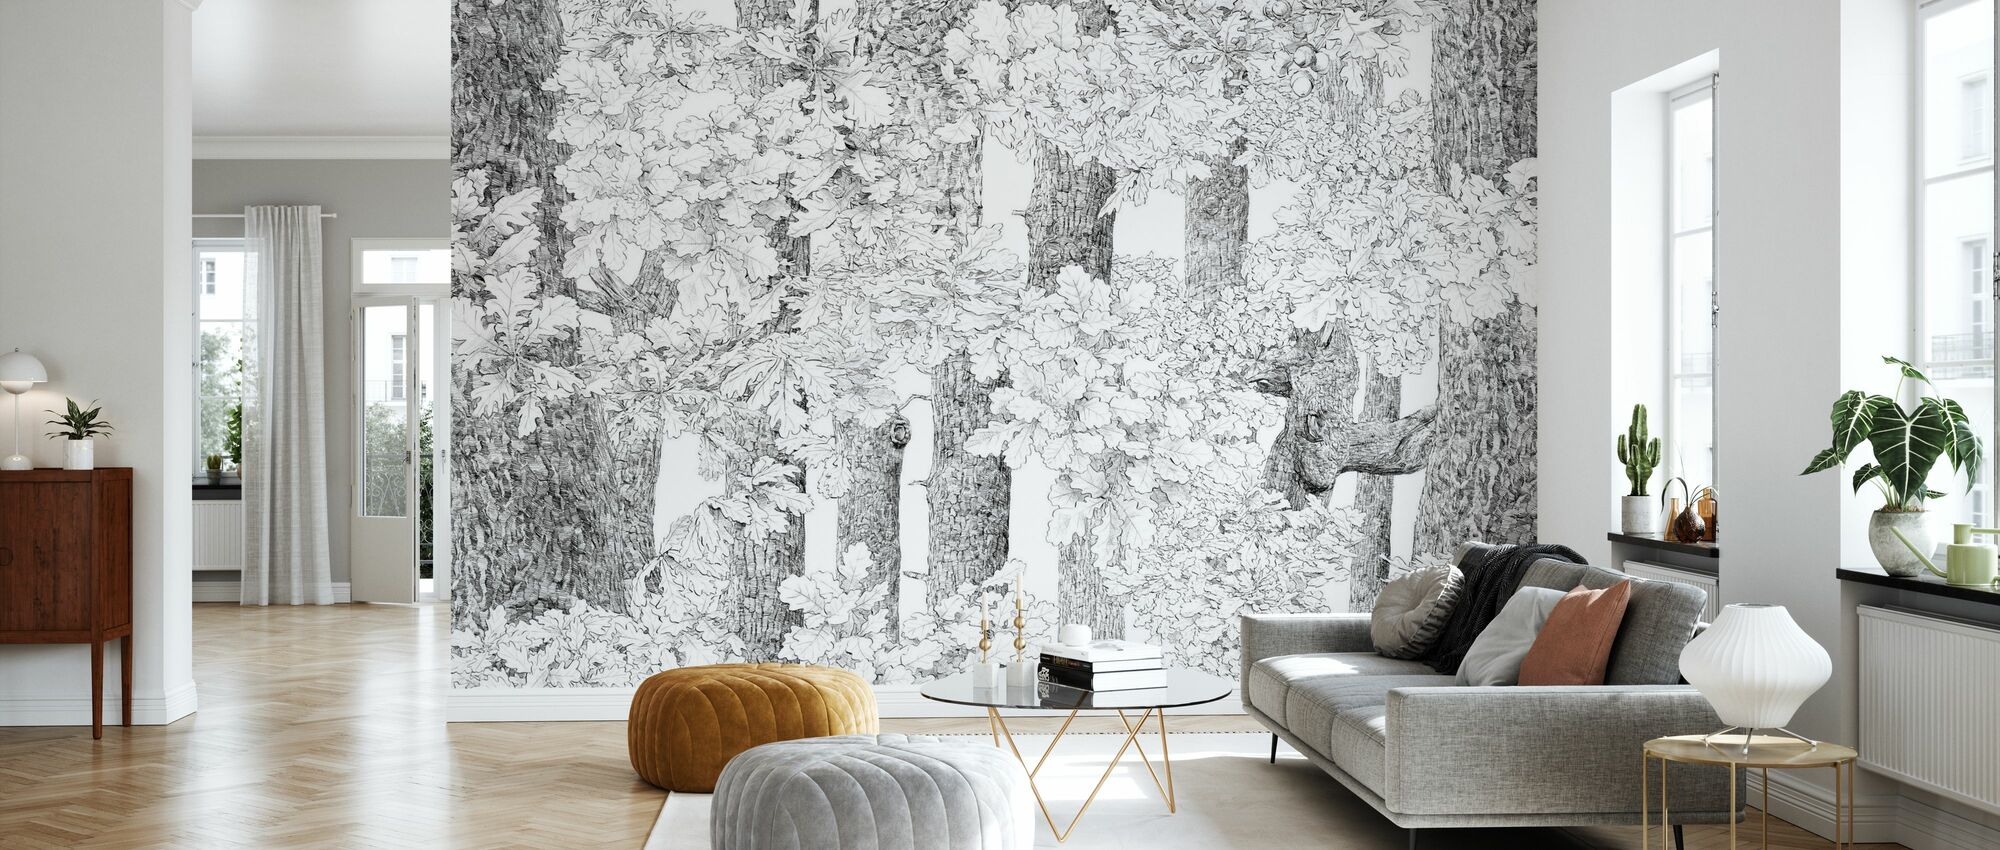 Core of Nature - Wallpaper - Living Room